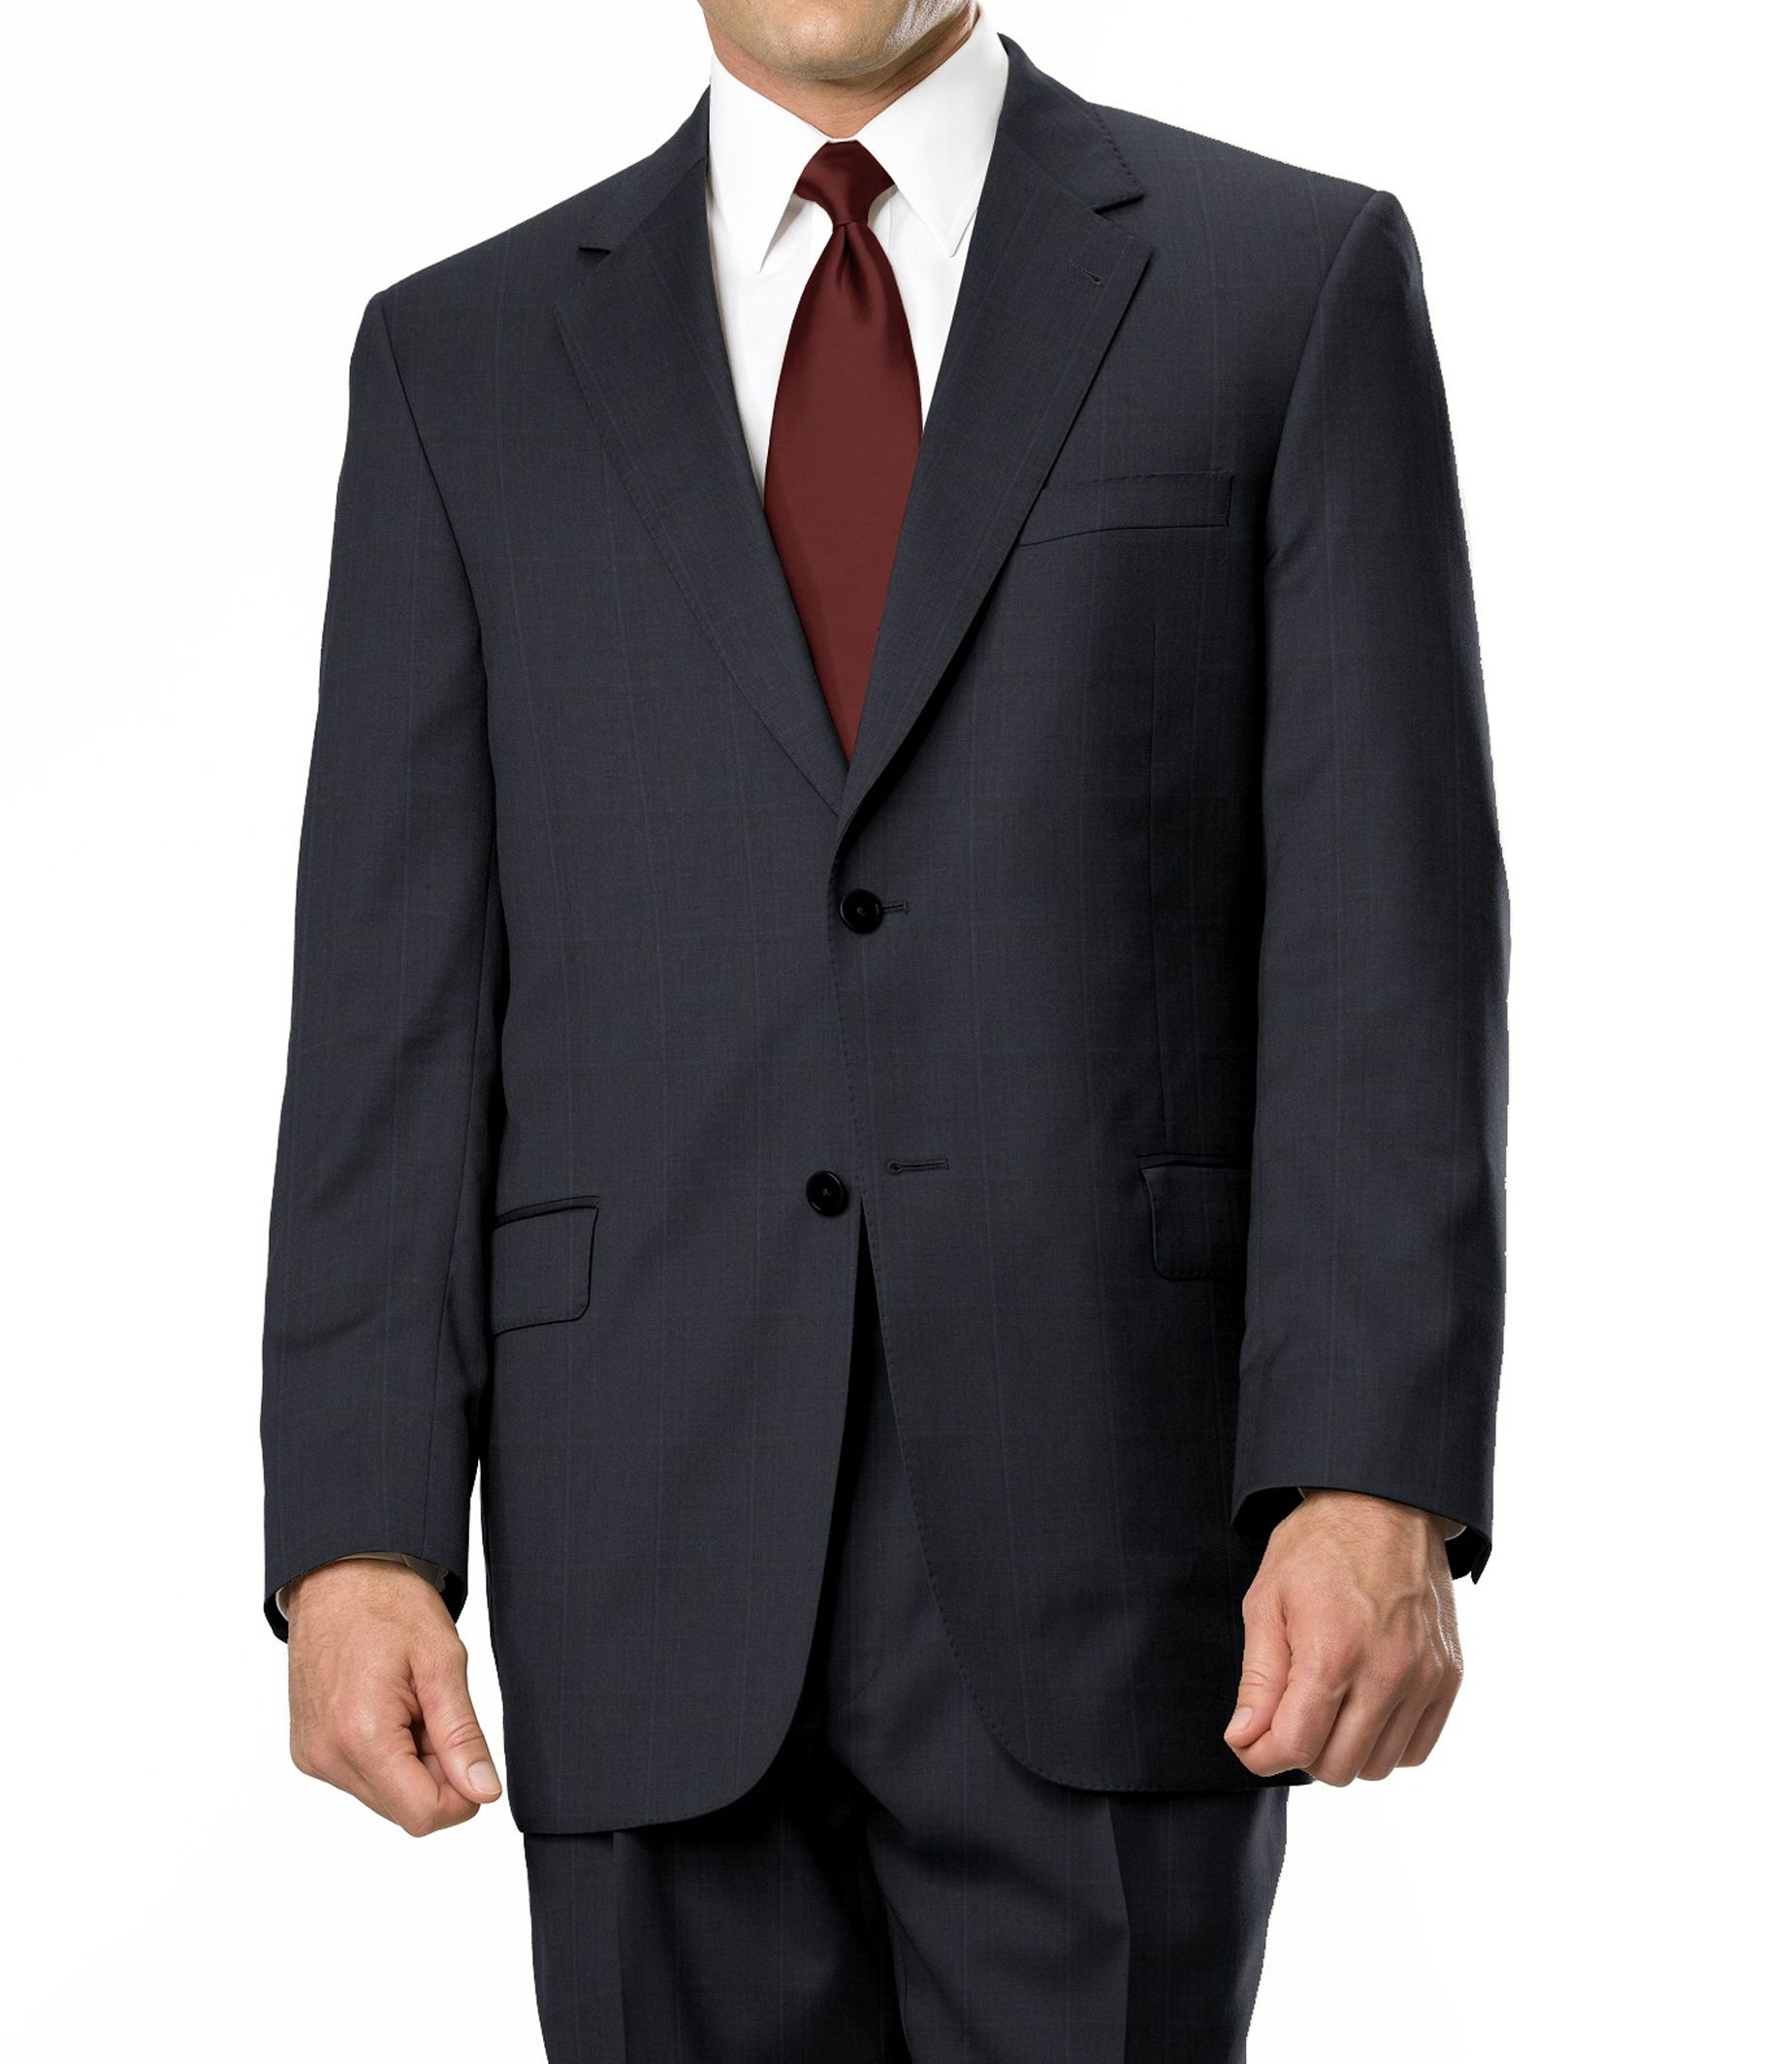 Signature Gold 2-Button Wool Suit- Sizes 44 X-Long-52- Black/White/Grey/Navy Birdseye